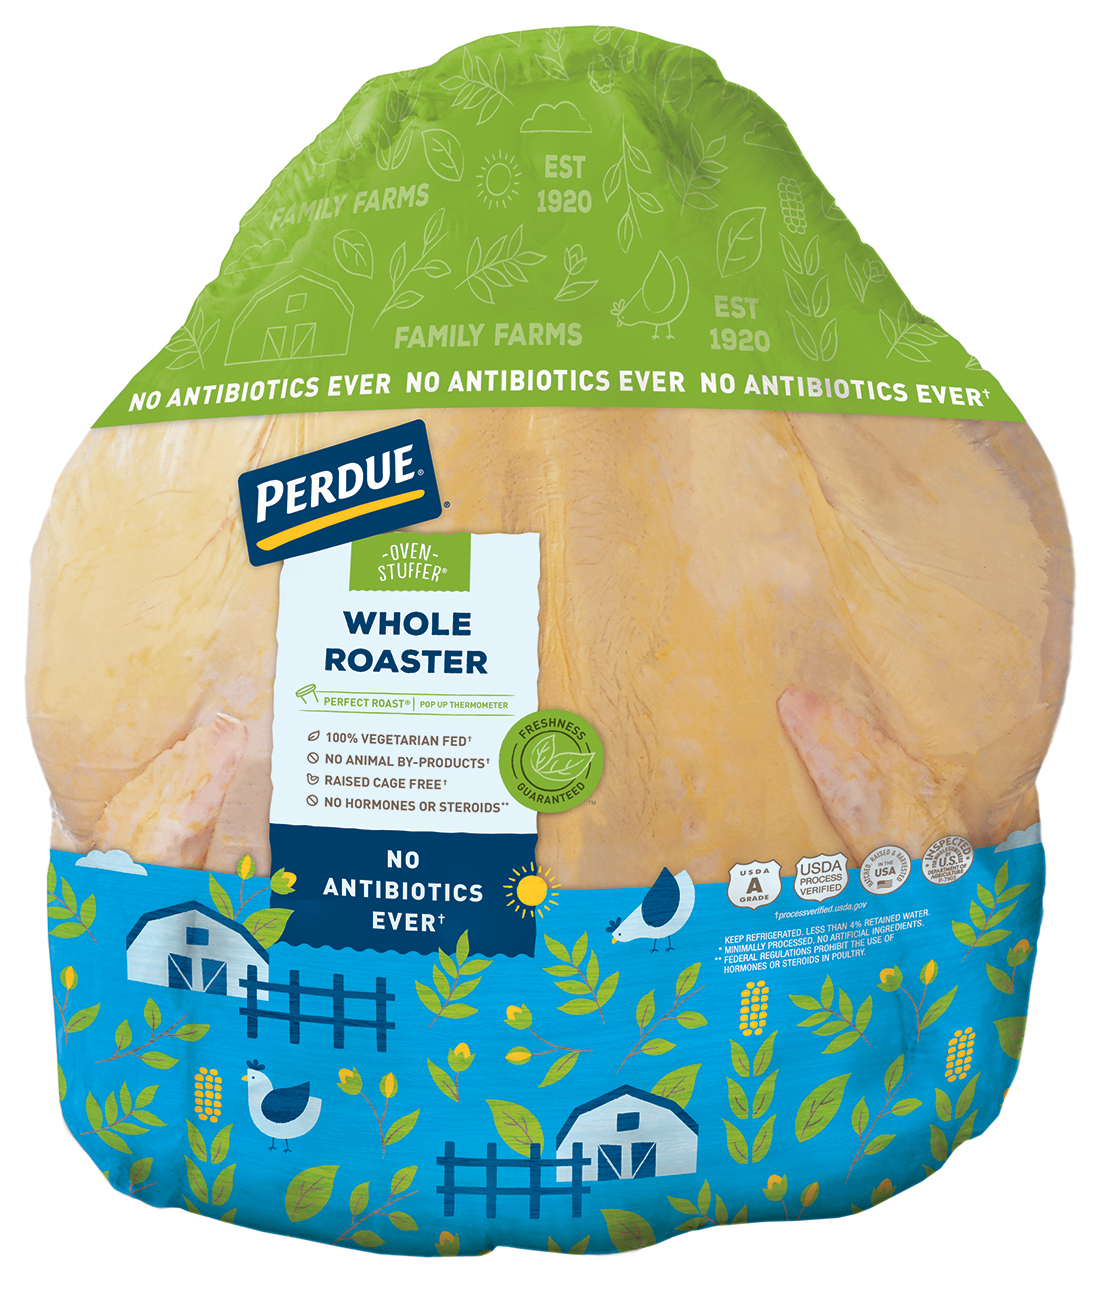 Perdue S New Packaging King Kullen